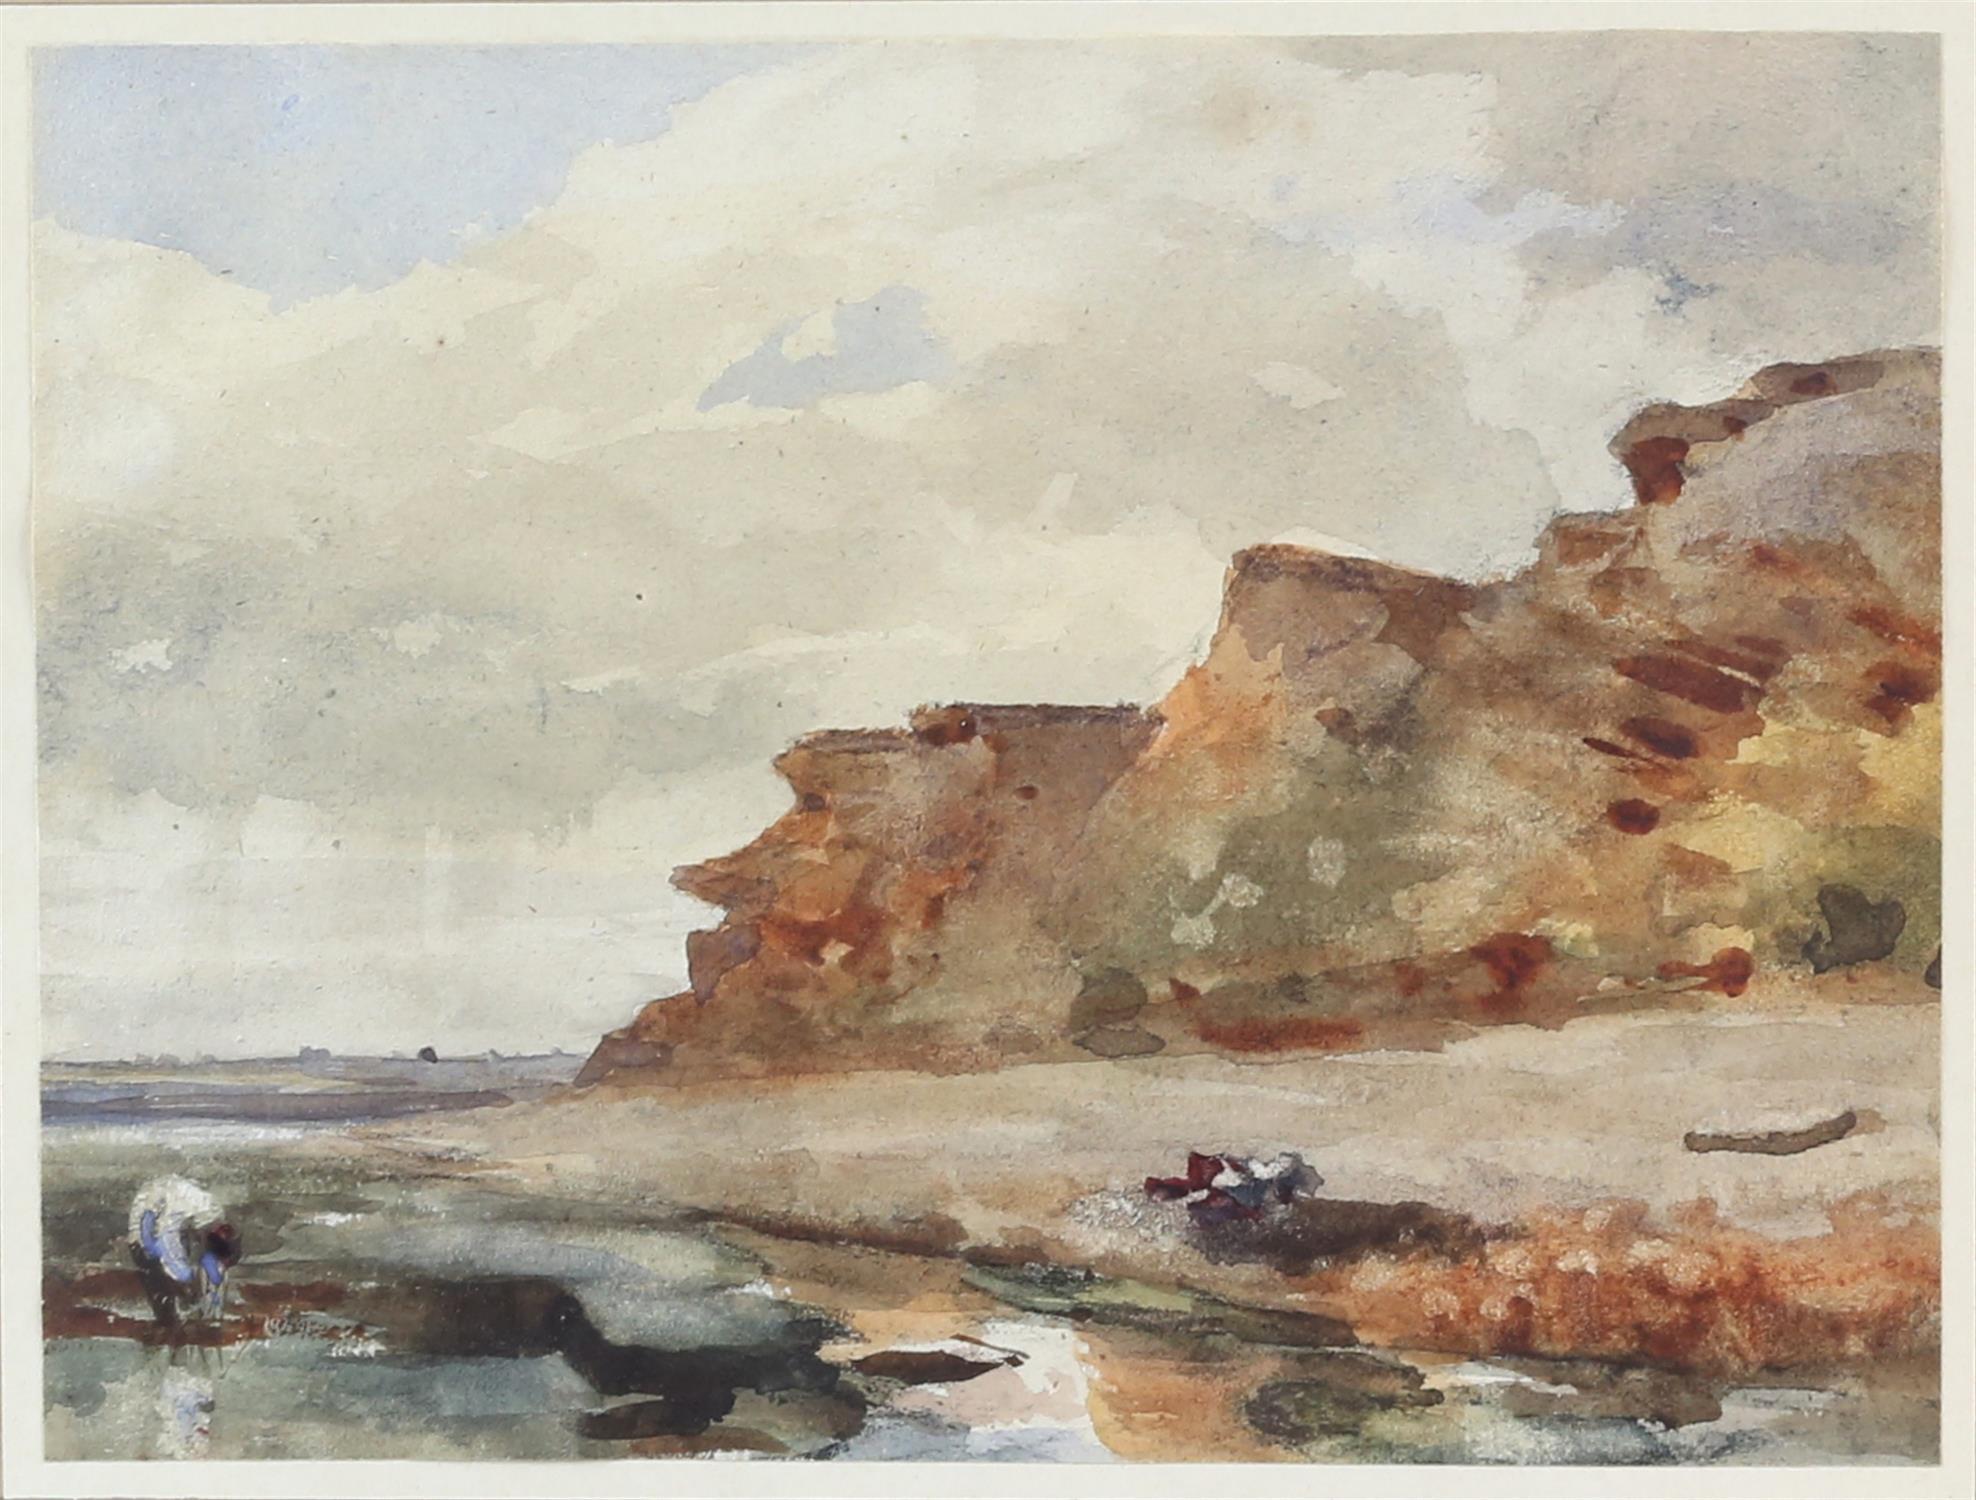 Thomas Churchyard (British, 1798-1865), Bawdsey Cliff, Suffolk. Watercolour. Stanhope Shelton